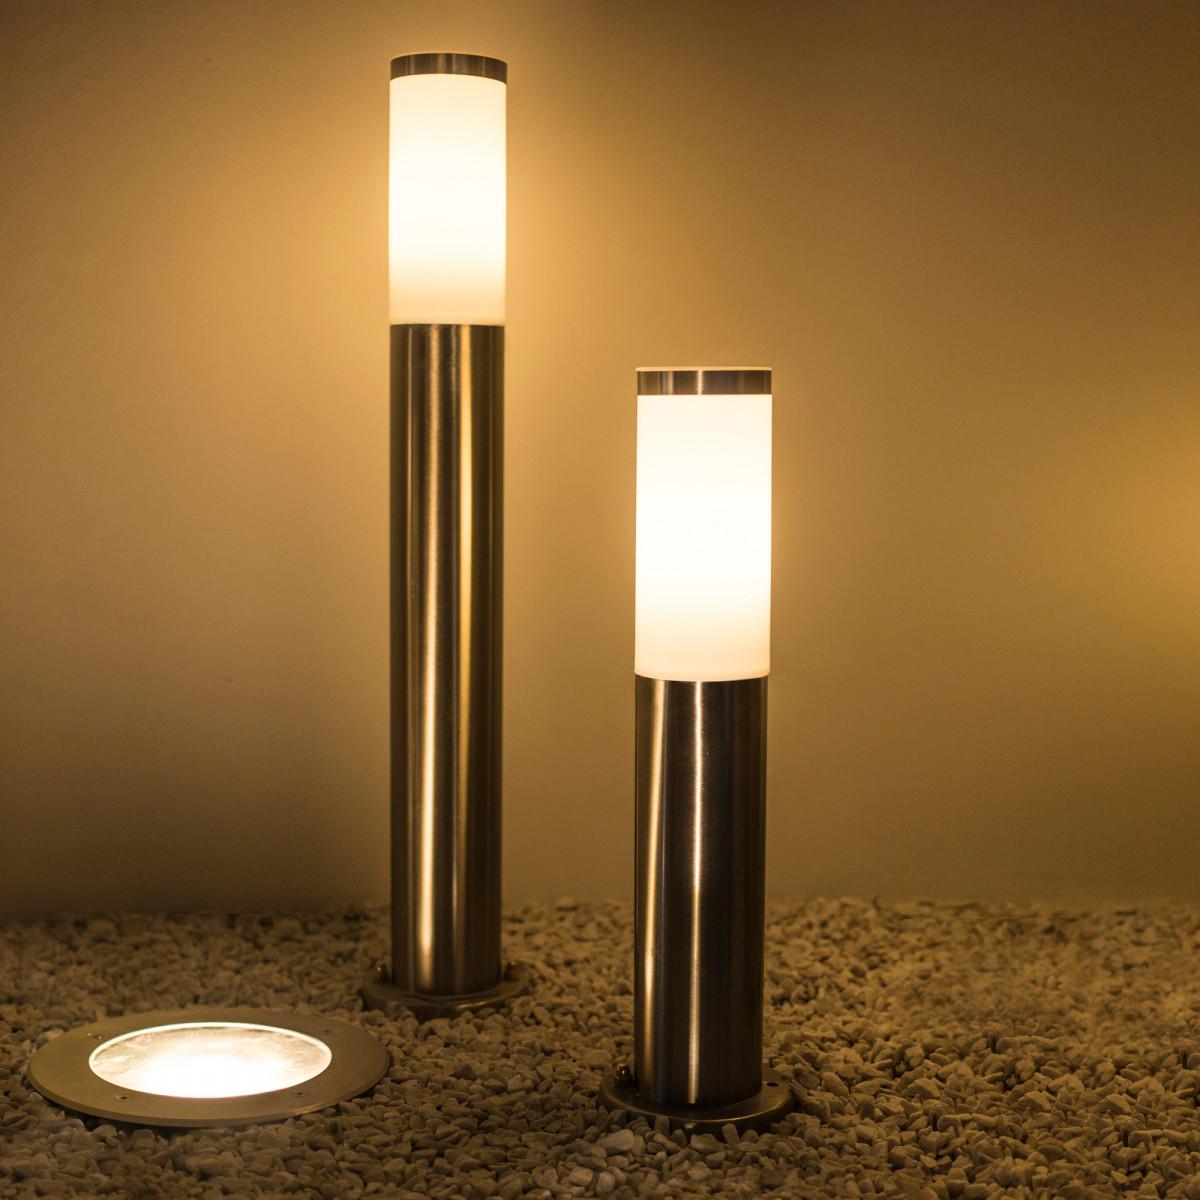 Lech 2 Terrassenlampe